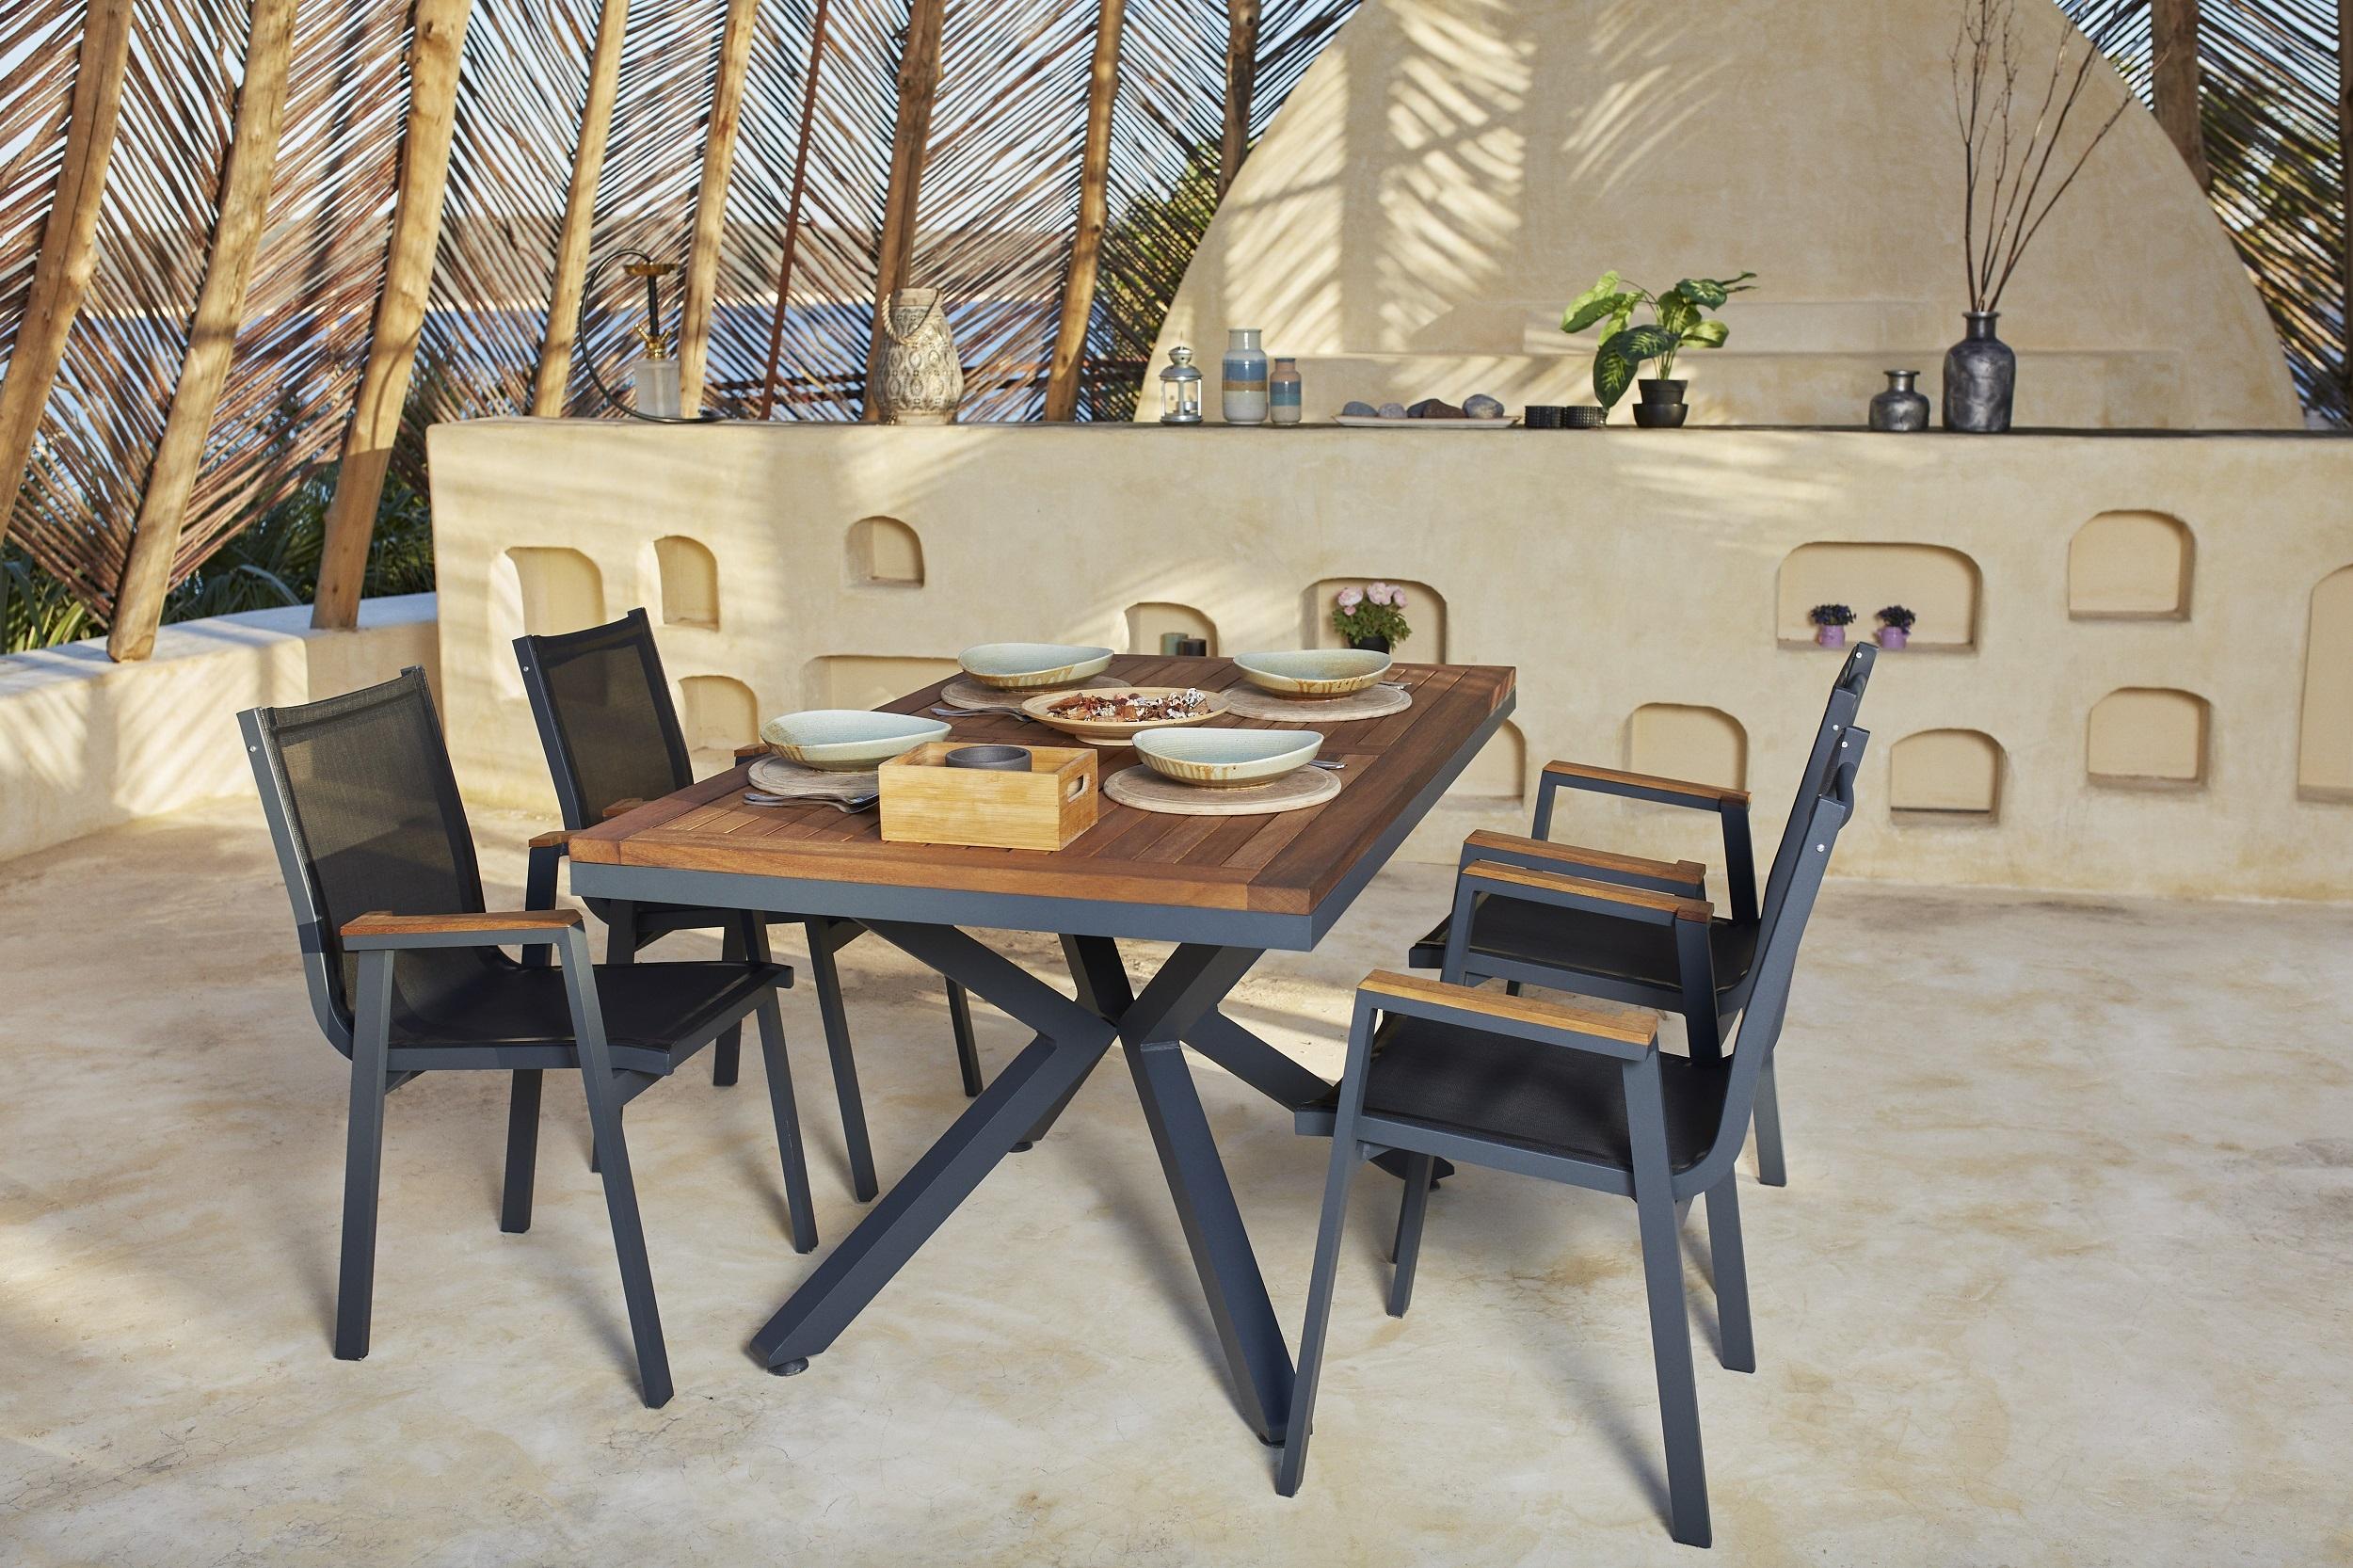 Set masa de gradina / terasa din aluminiu si lemn Sydney Natural / Antracit + 6 scaune de gradina Ottowa Antracit, L150xl90xH77 cm poza